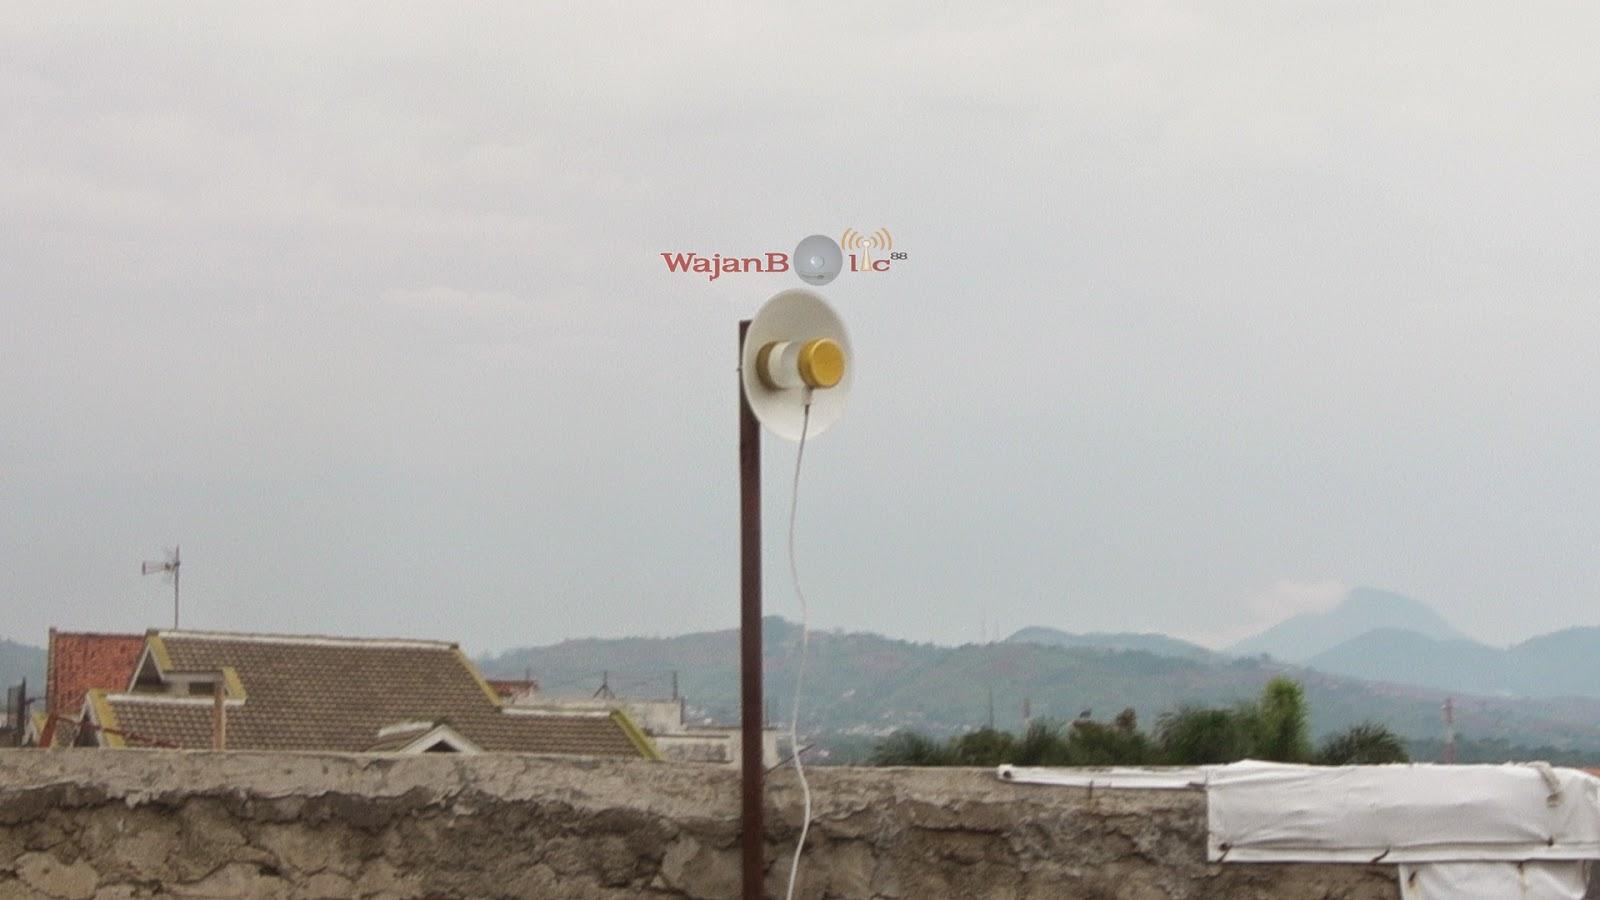 Paket Antena Wajan Bolic Ultimate Usb Wifi 150mbps Wajanbolic88